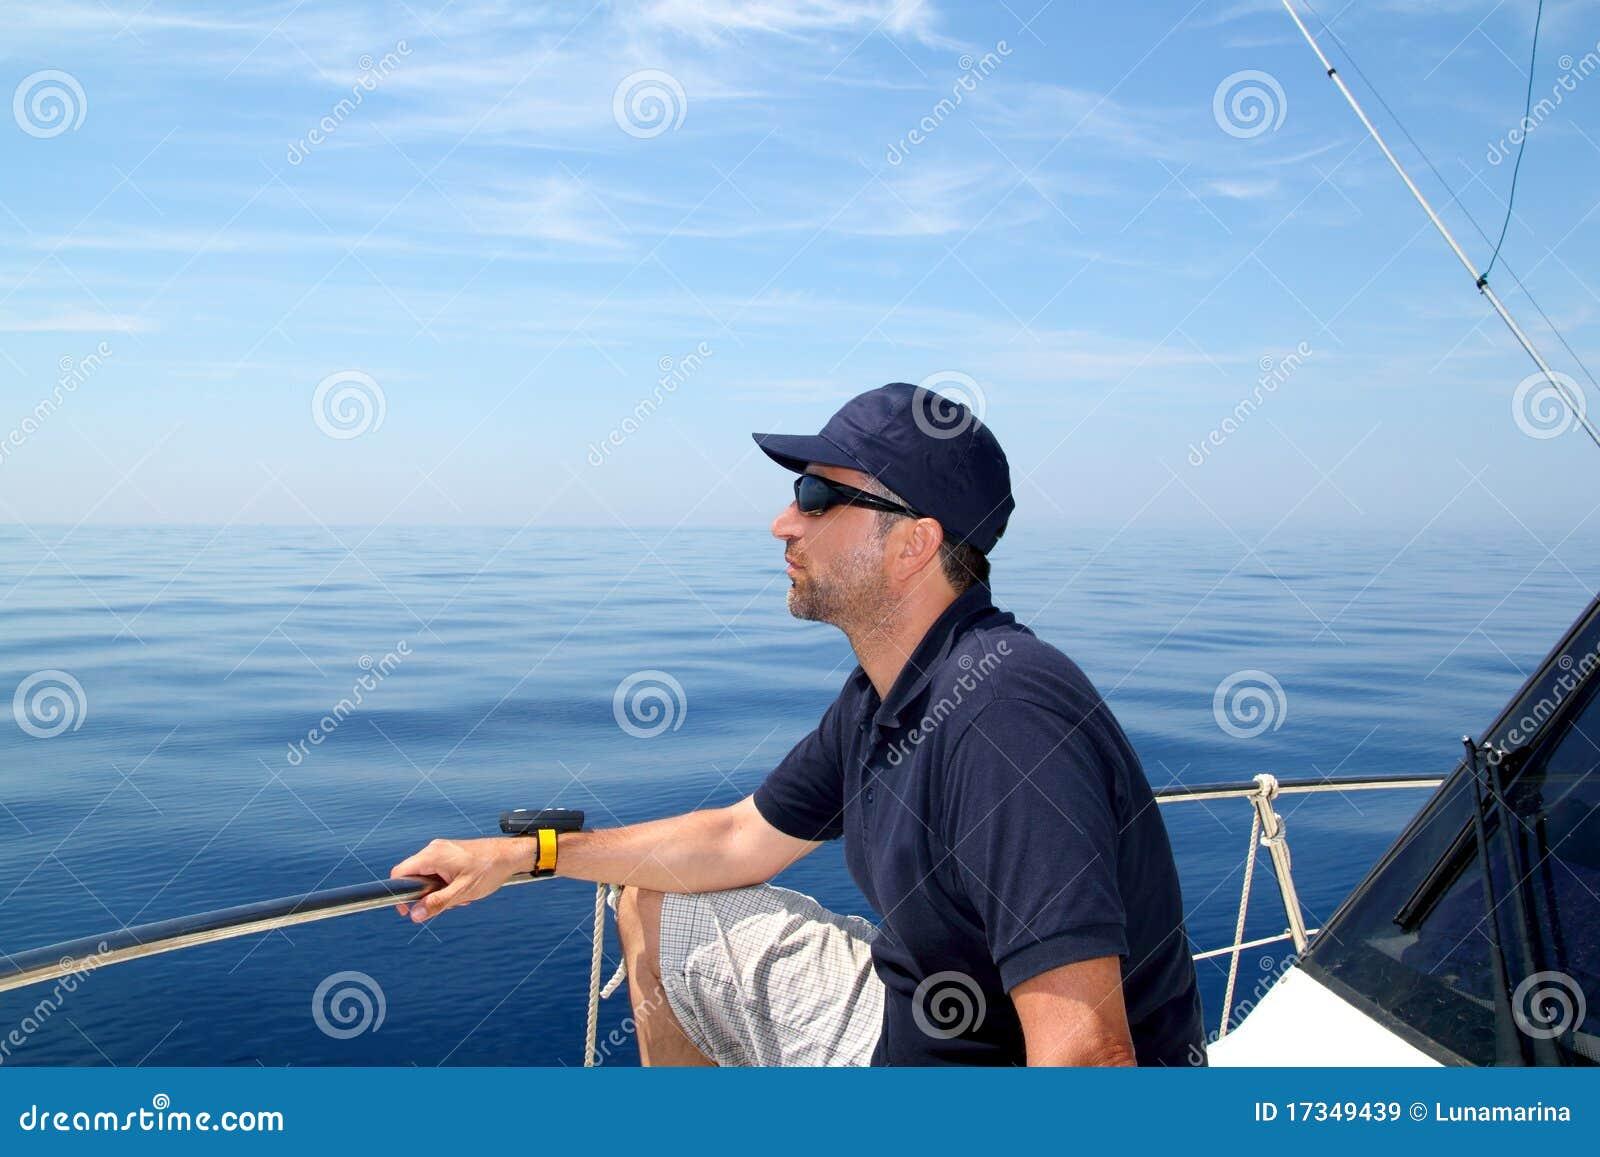 Sailor Man Sailing Boat Blue Calm Ocean Water Royalty Free ...